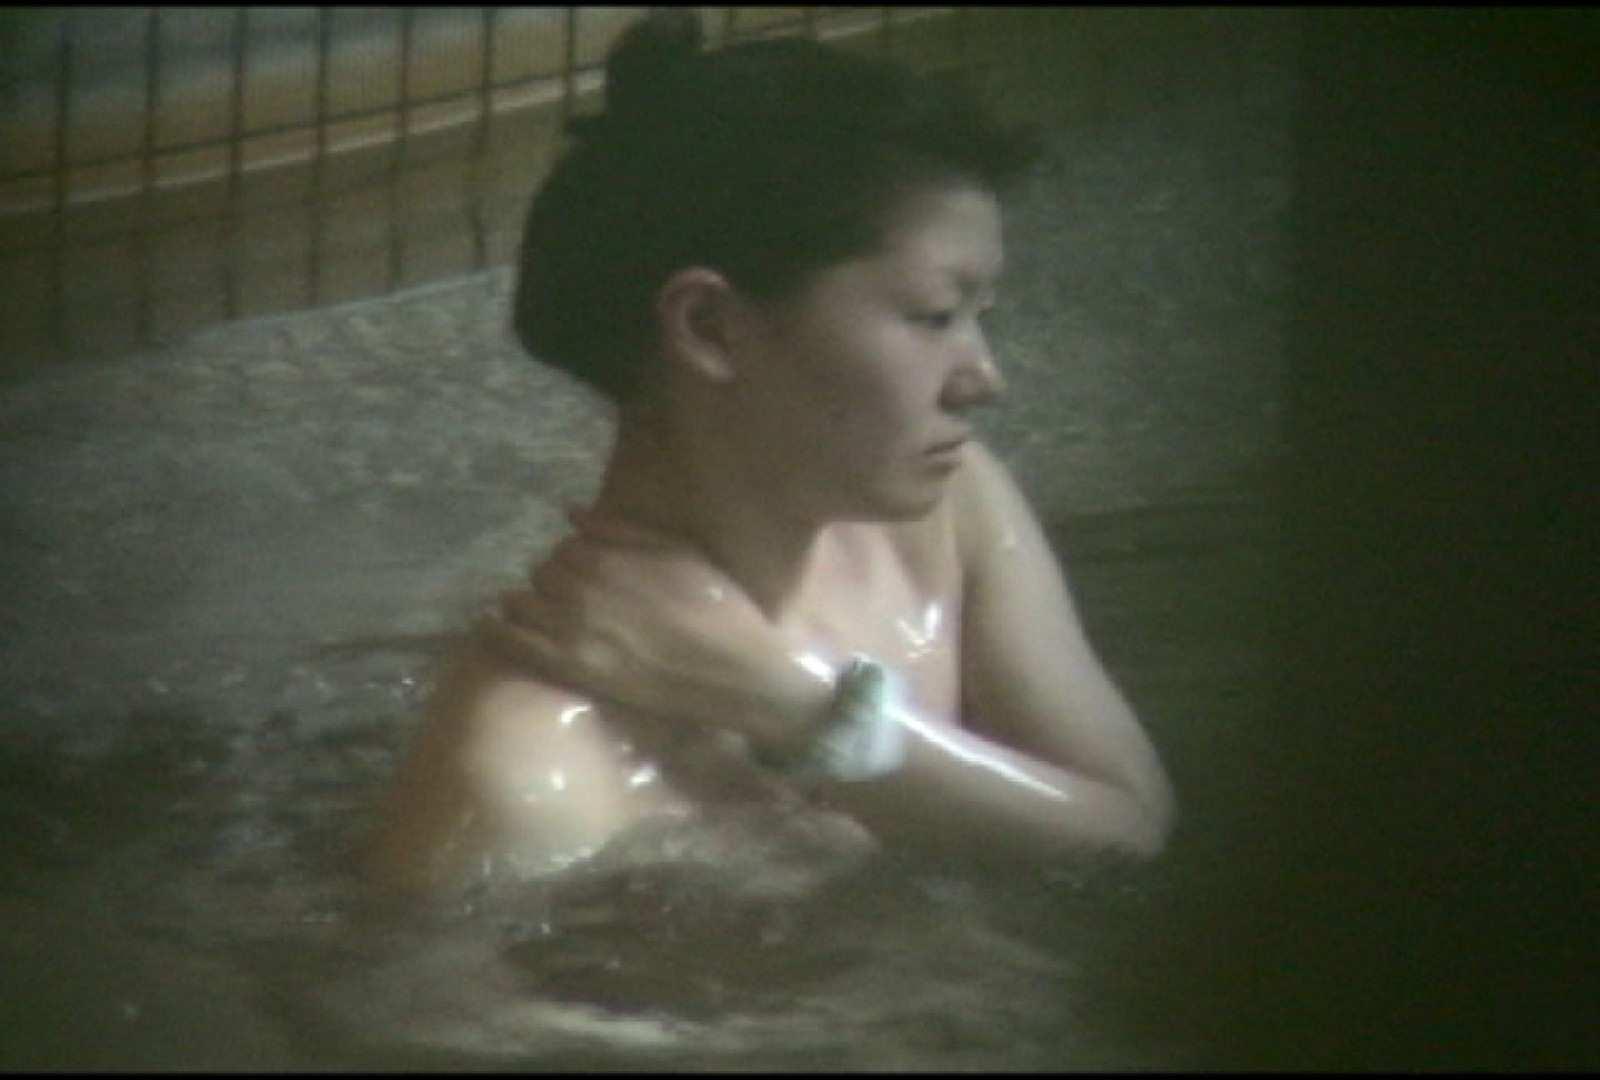 Aquaな露天風呂Vol.699 盗撮シリーズ   露天風呂編  93PIX 41